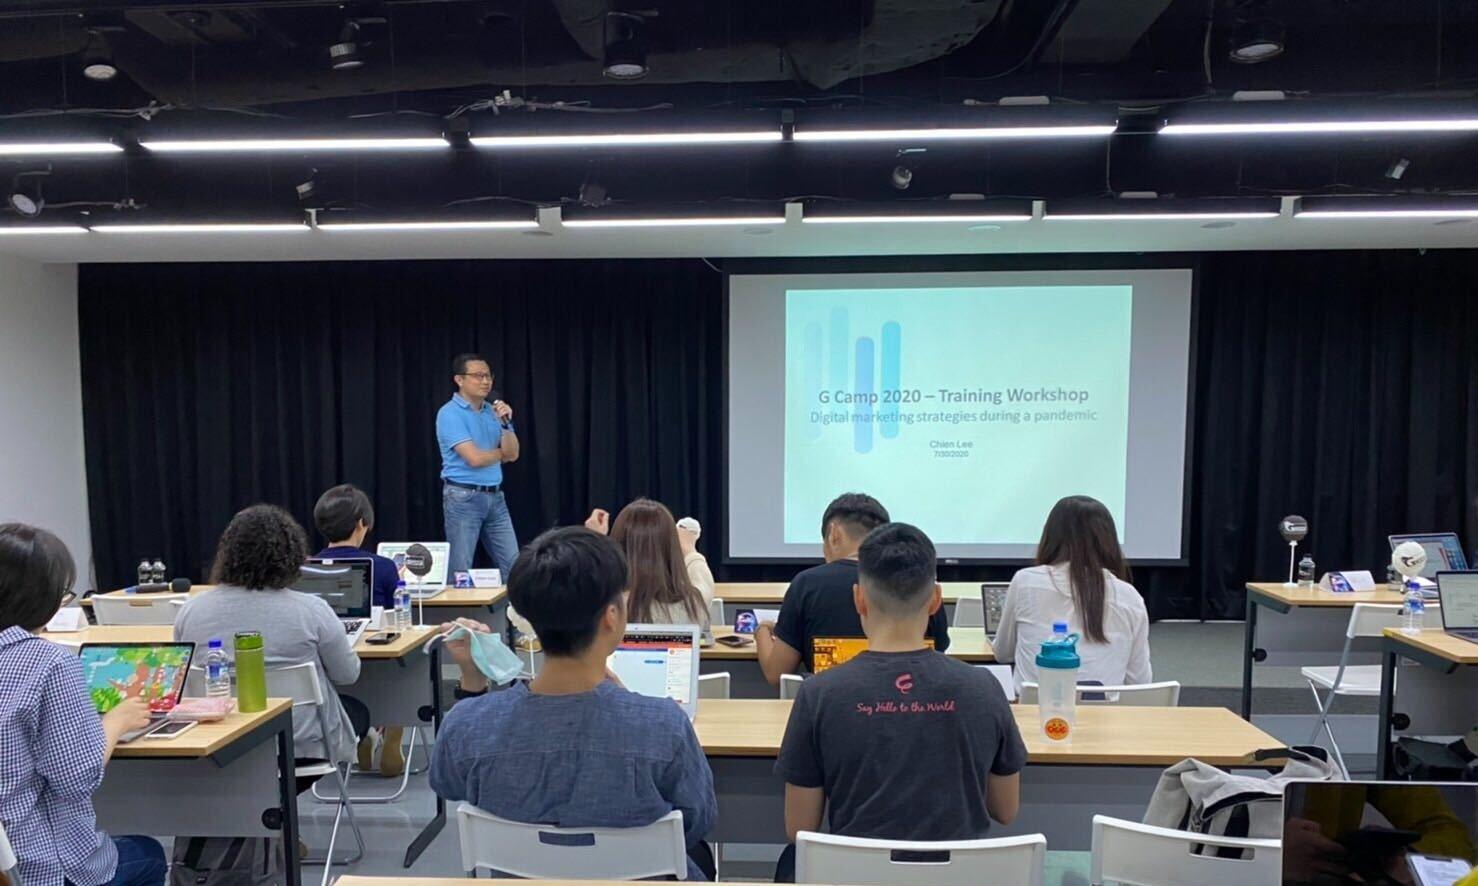 SparkAmplify 創辦人陳健群參與GCamp工作坊